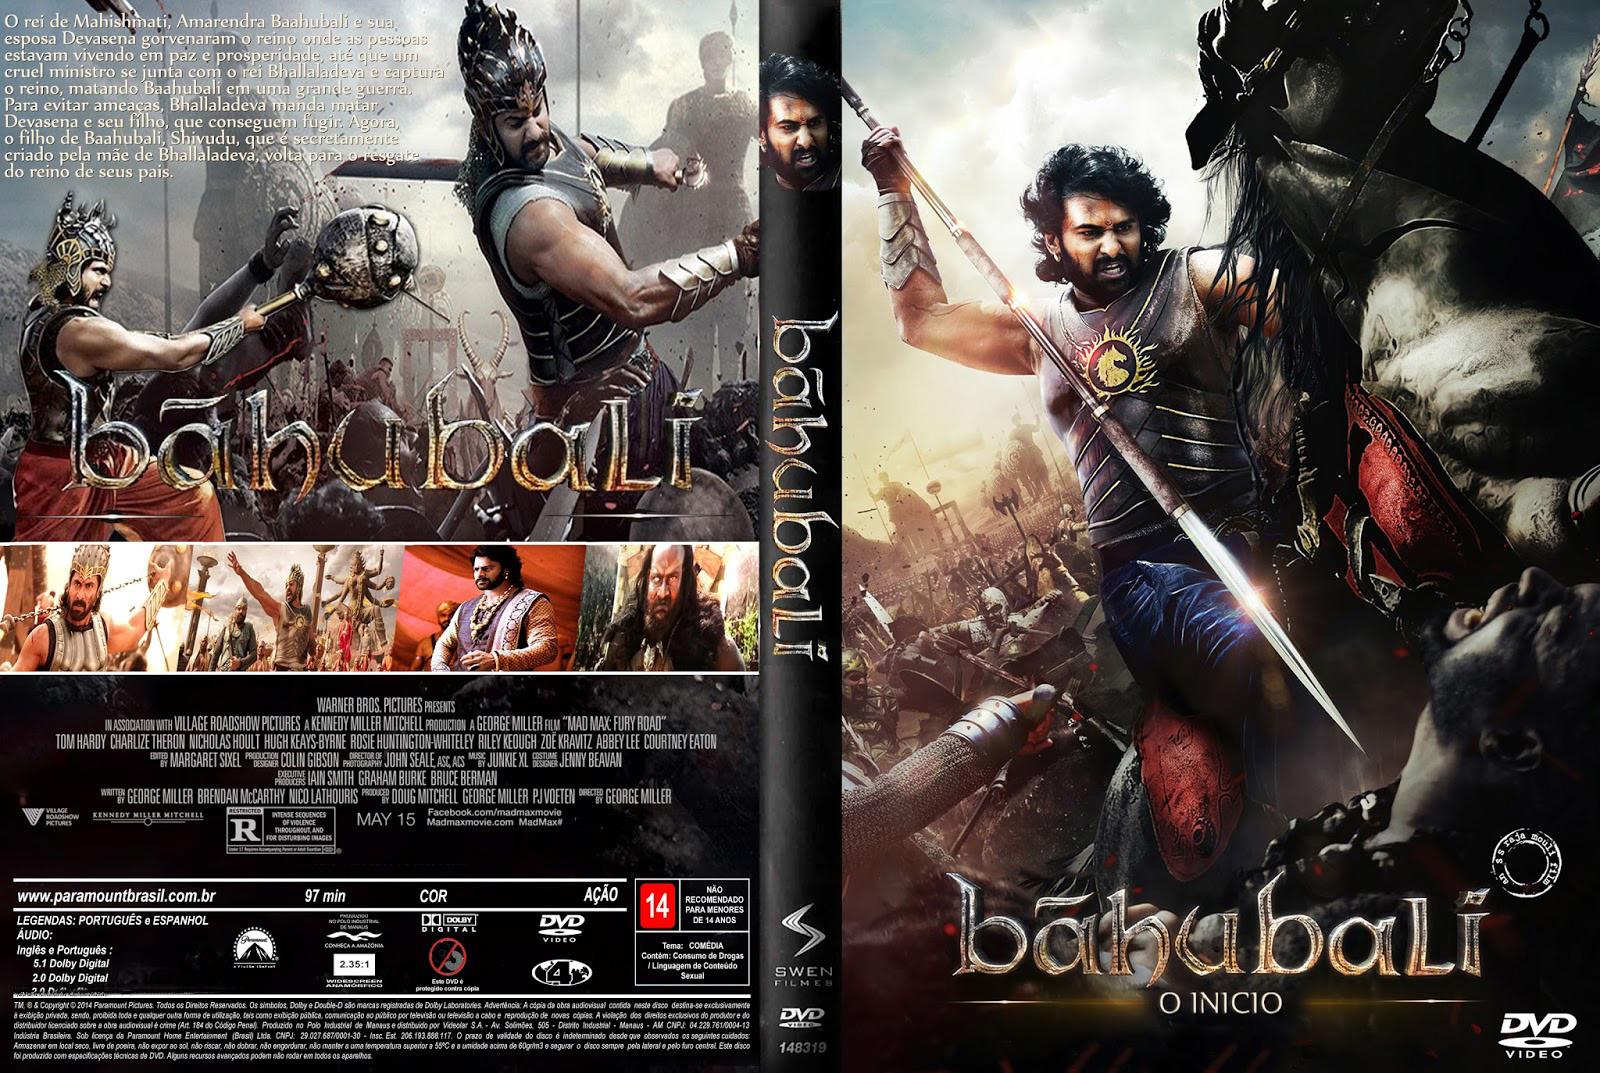 Download Baahubali O Inicio DVD-R